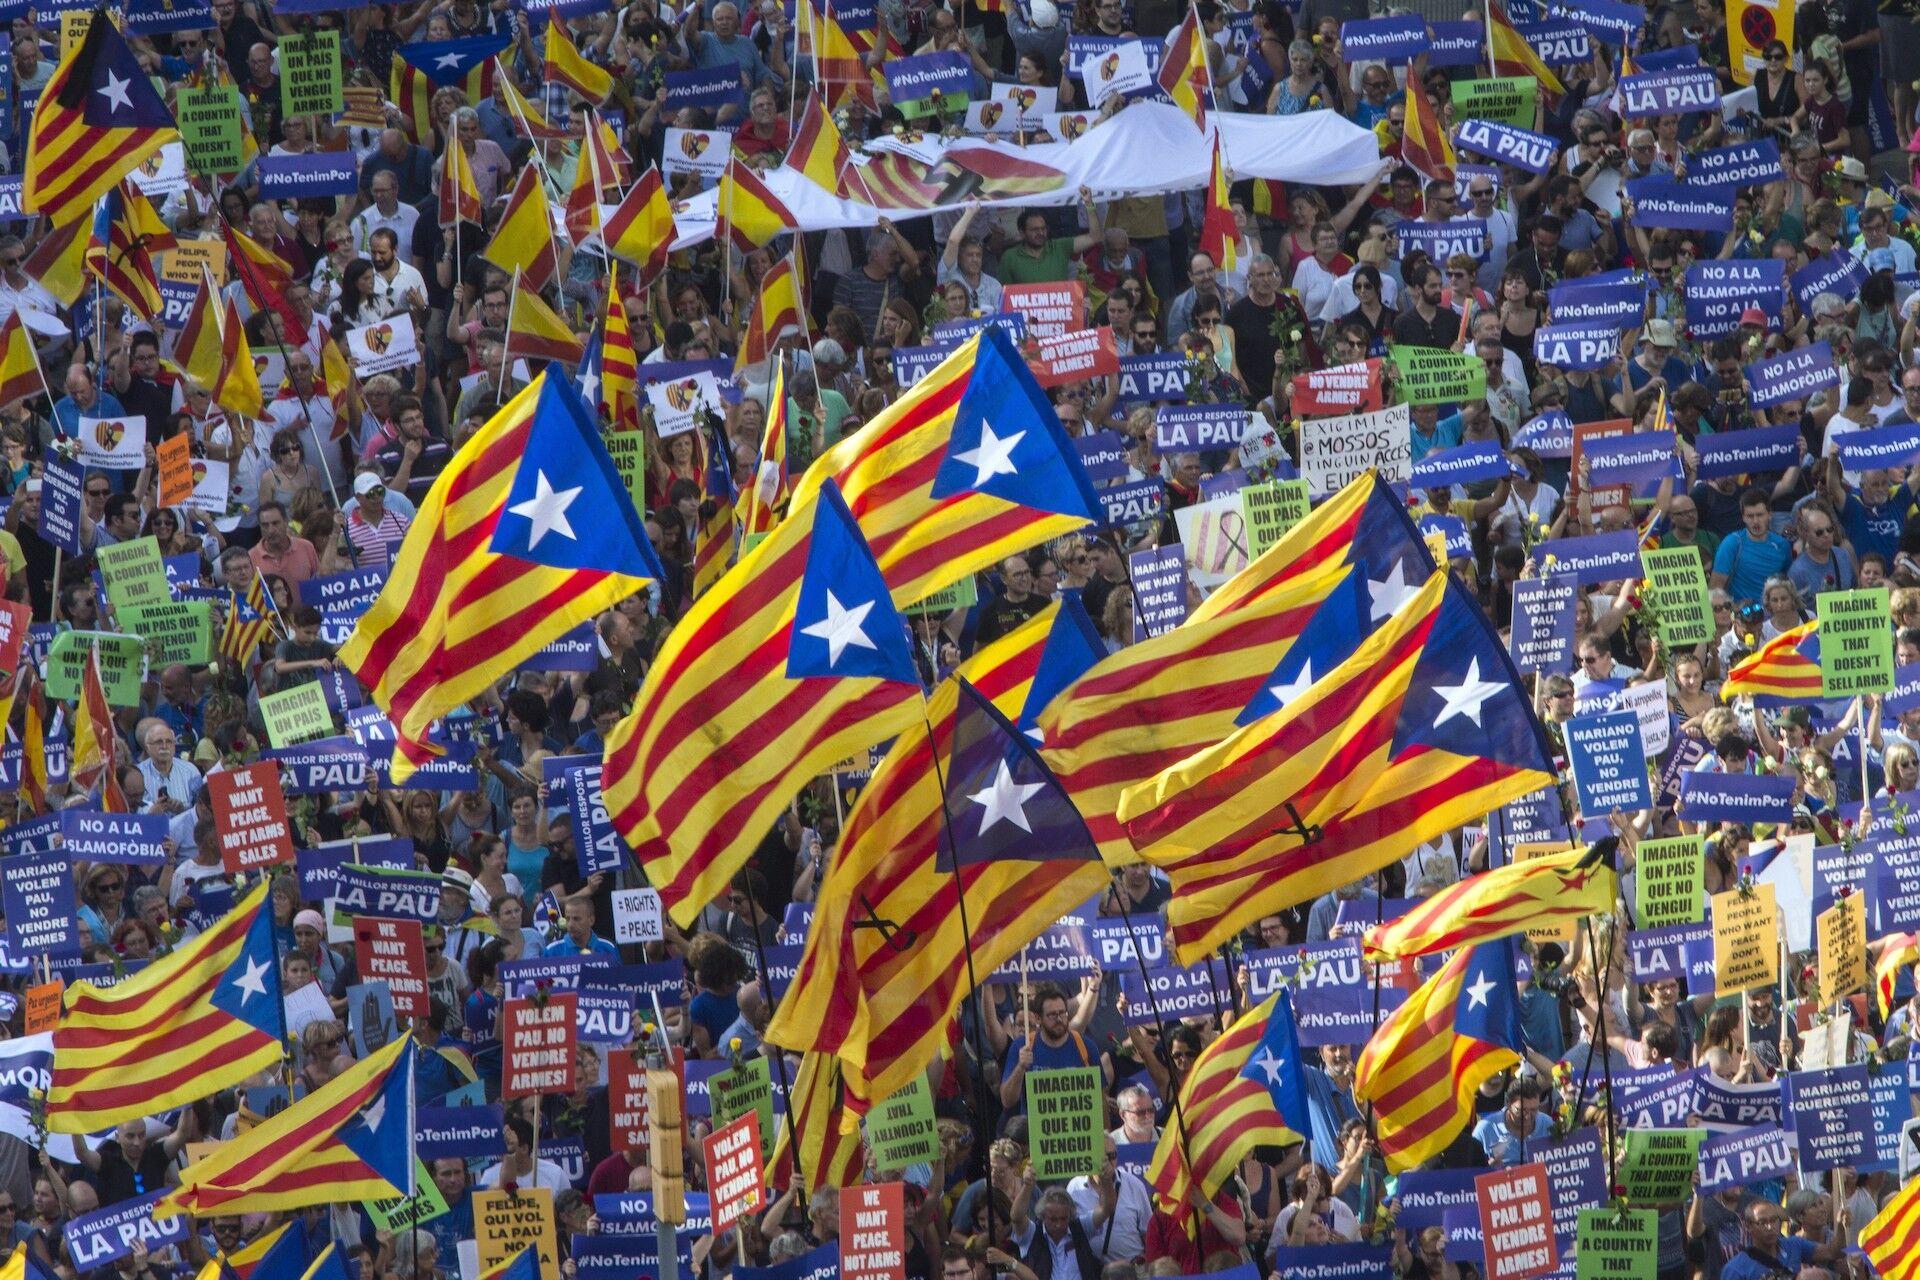 La Diada del Terror: no a la islamofobia, sí a la hispanofobia